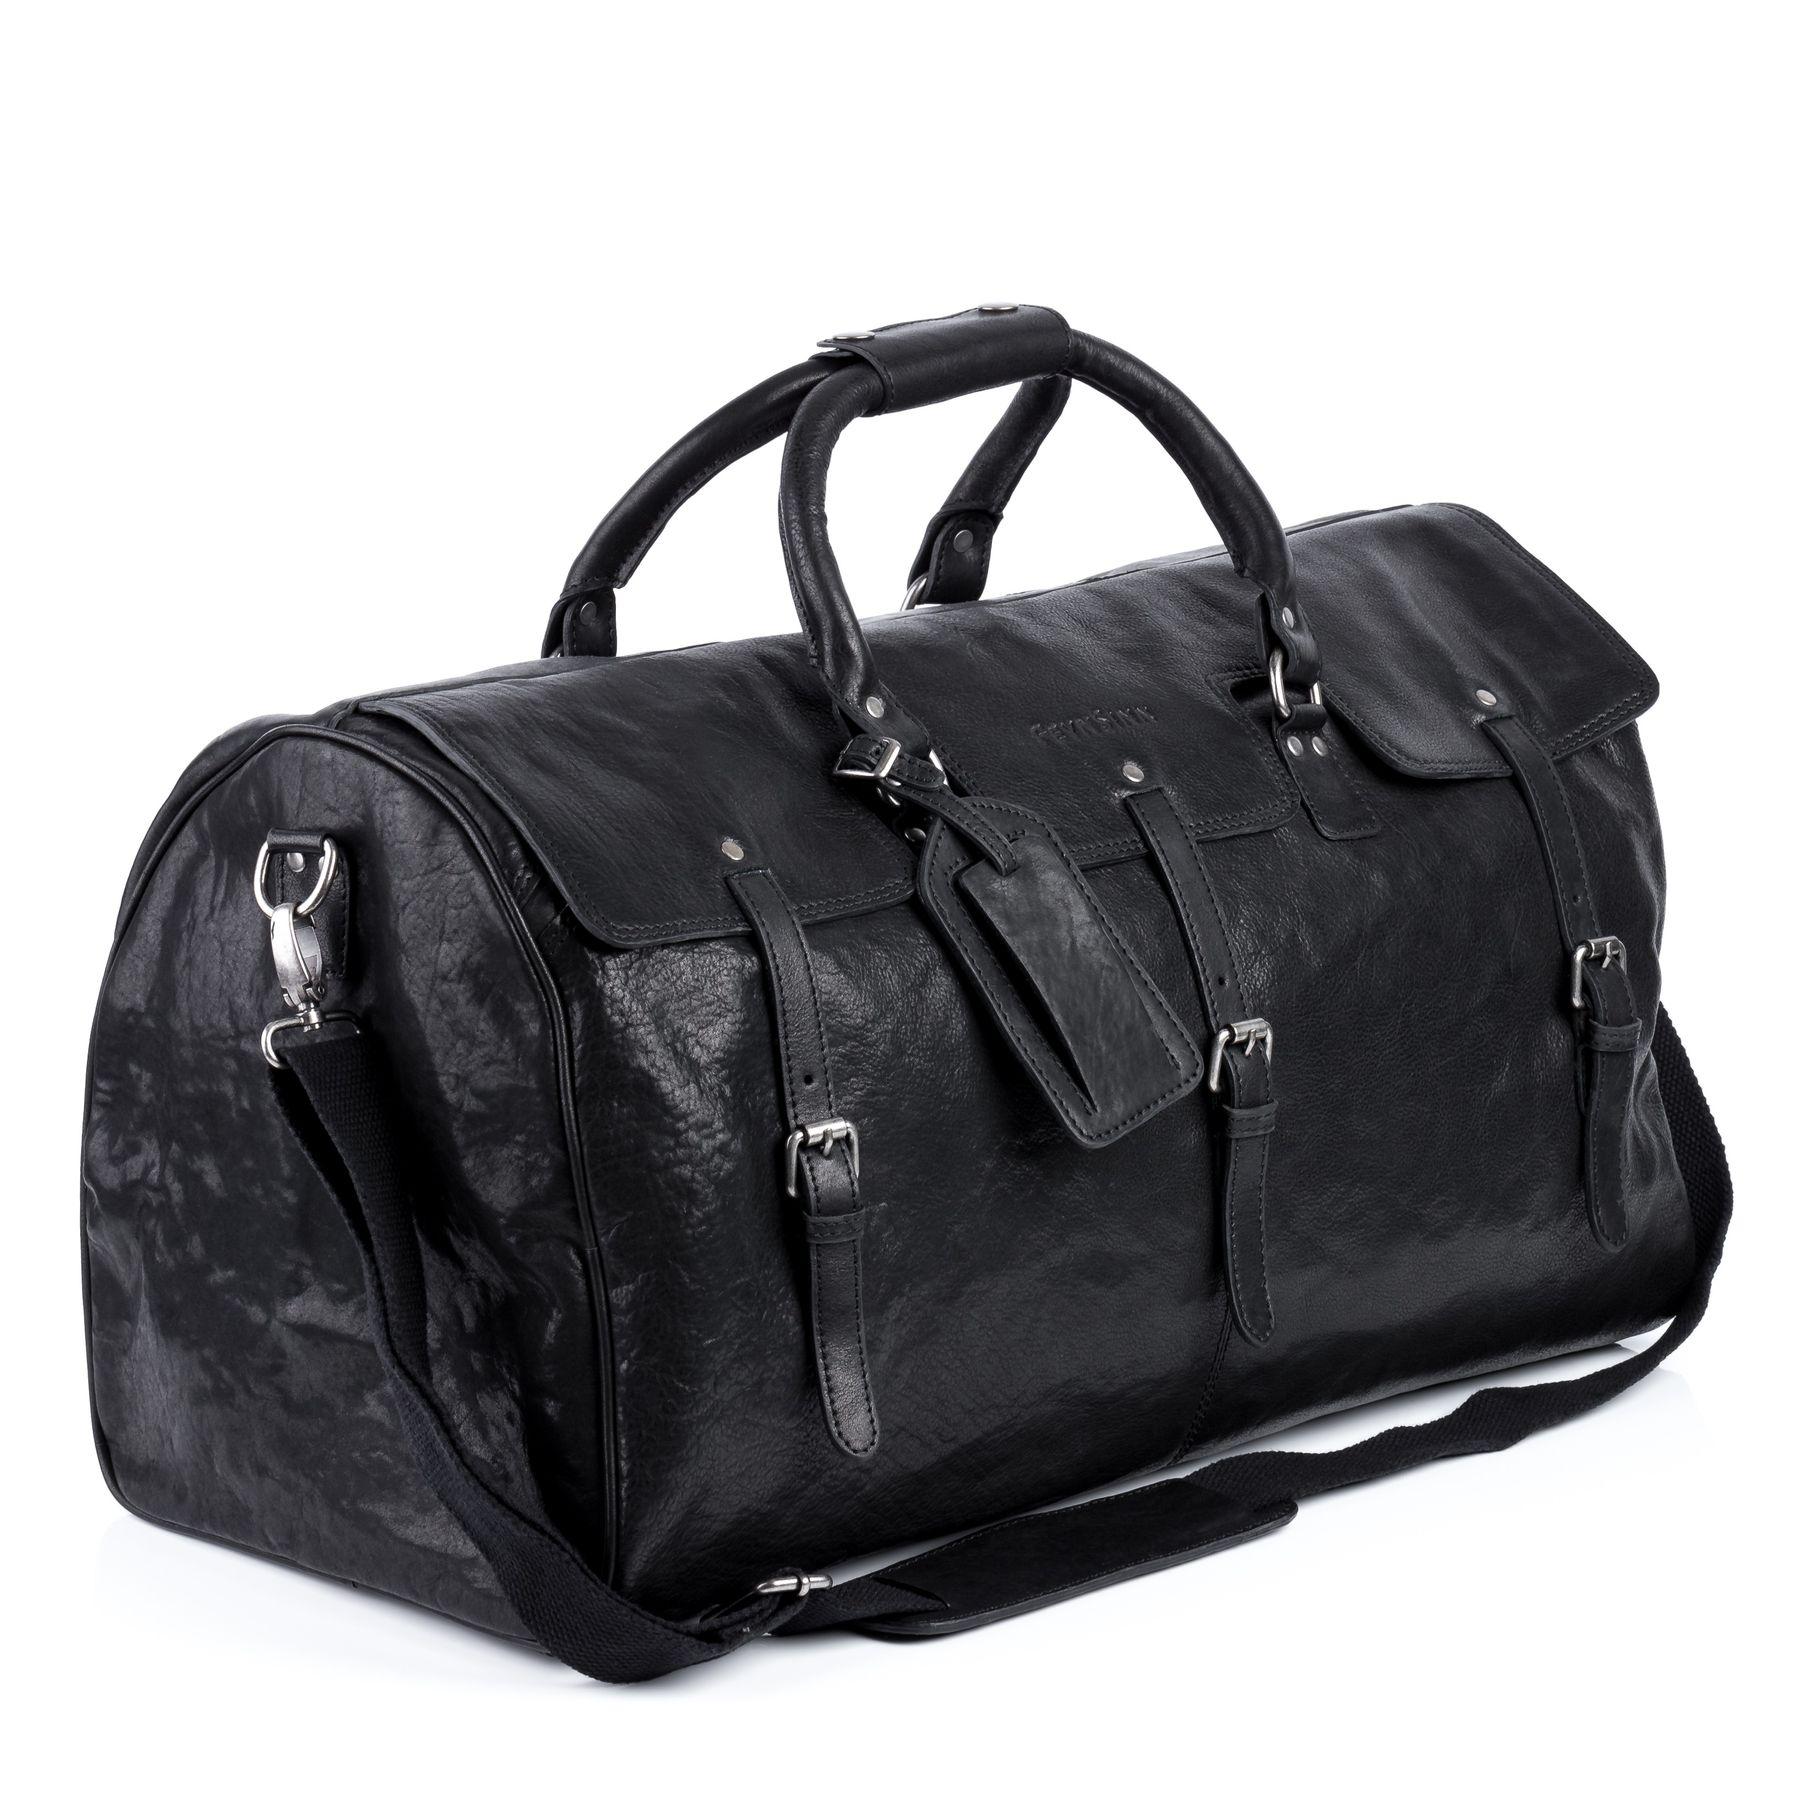 09039185ad72 FEYNSINN travel bag holdall Smooth Leather SELMA black weekender ...